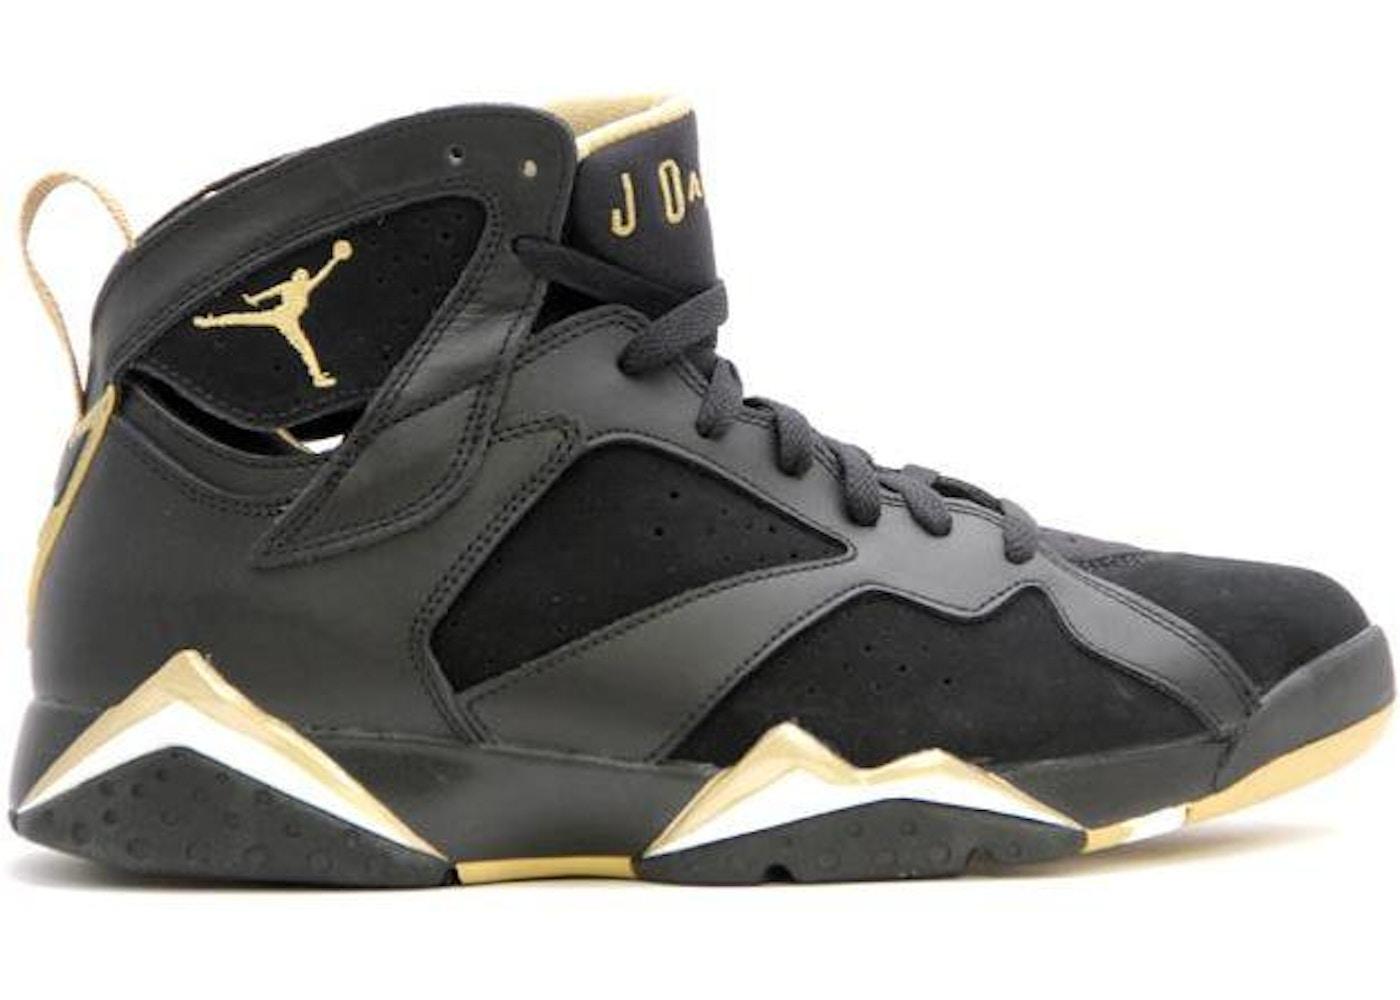 ad5042fce3d Jordan 7 Retro Golden Moments Pack (6/7) - 304775-030